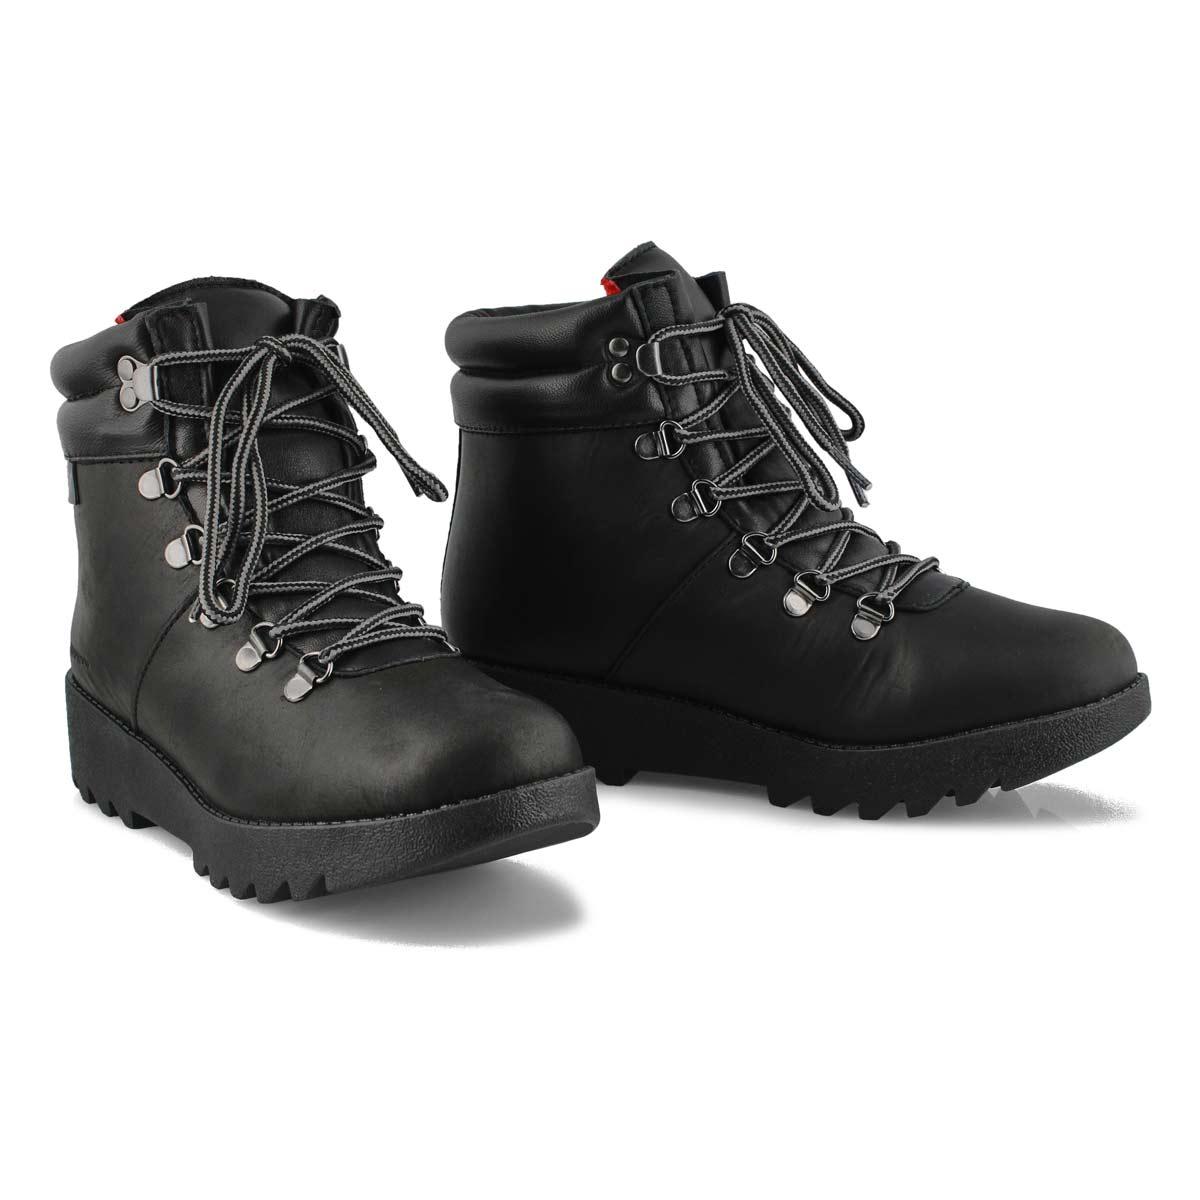 Women's PRESCOTT black waterproof winter boots